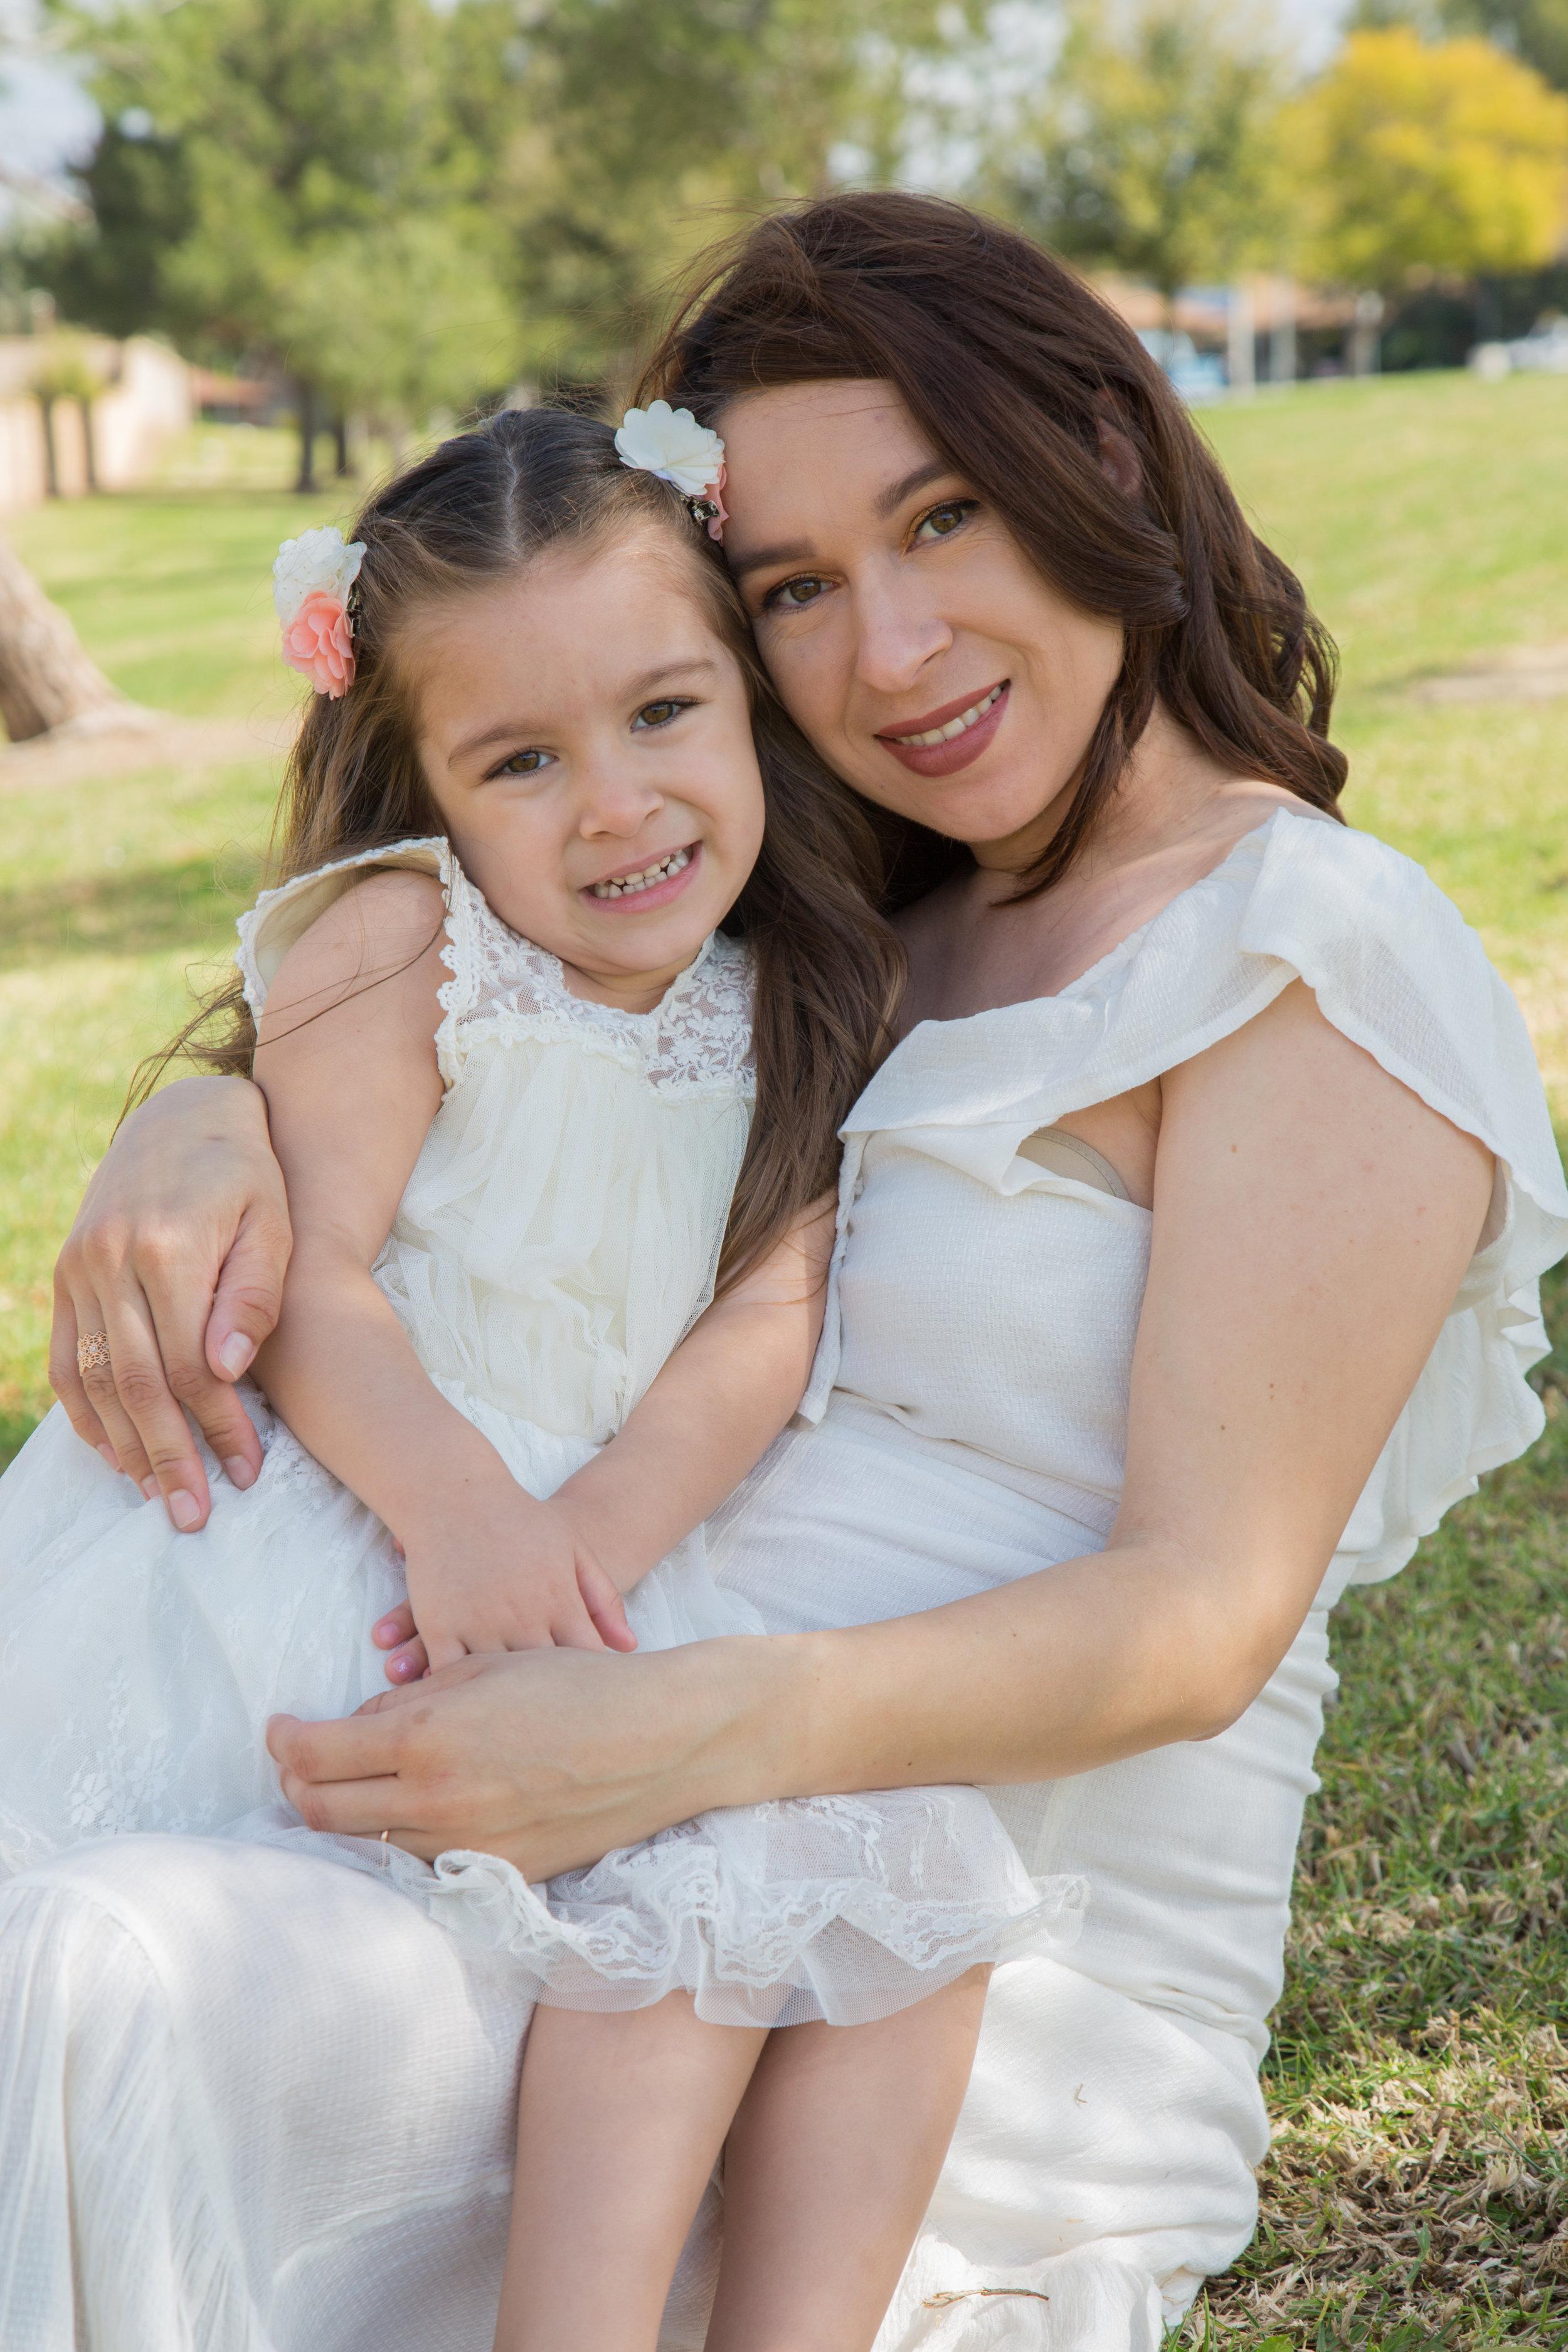 Vivianas_Maternity-55.jpg